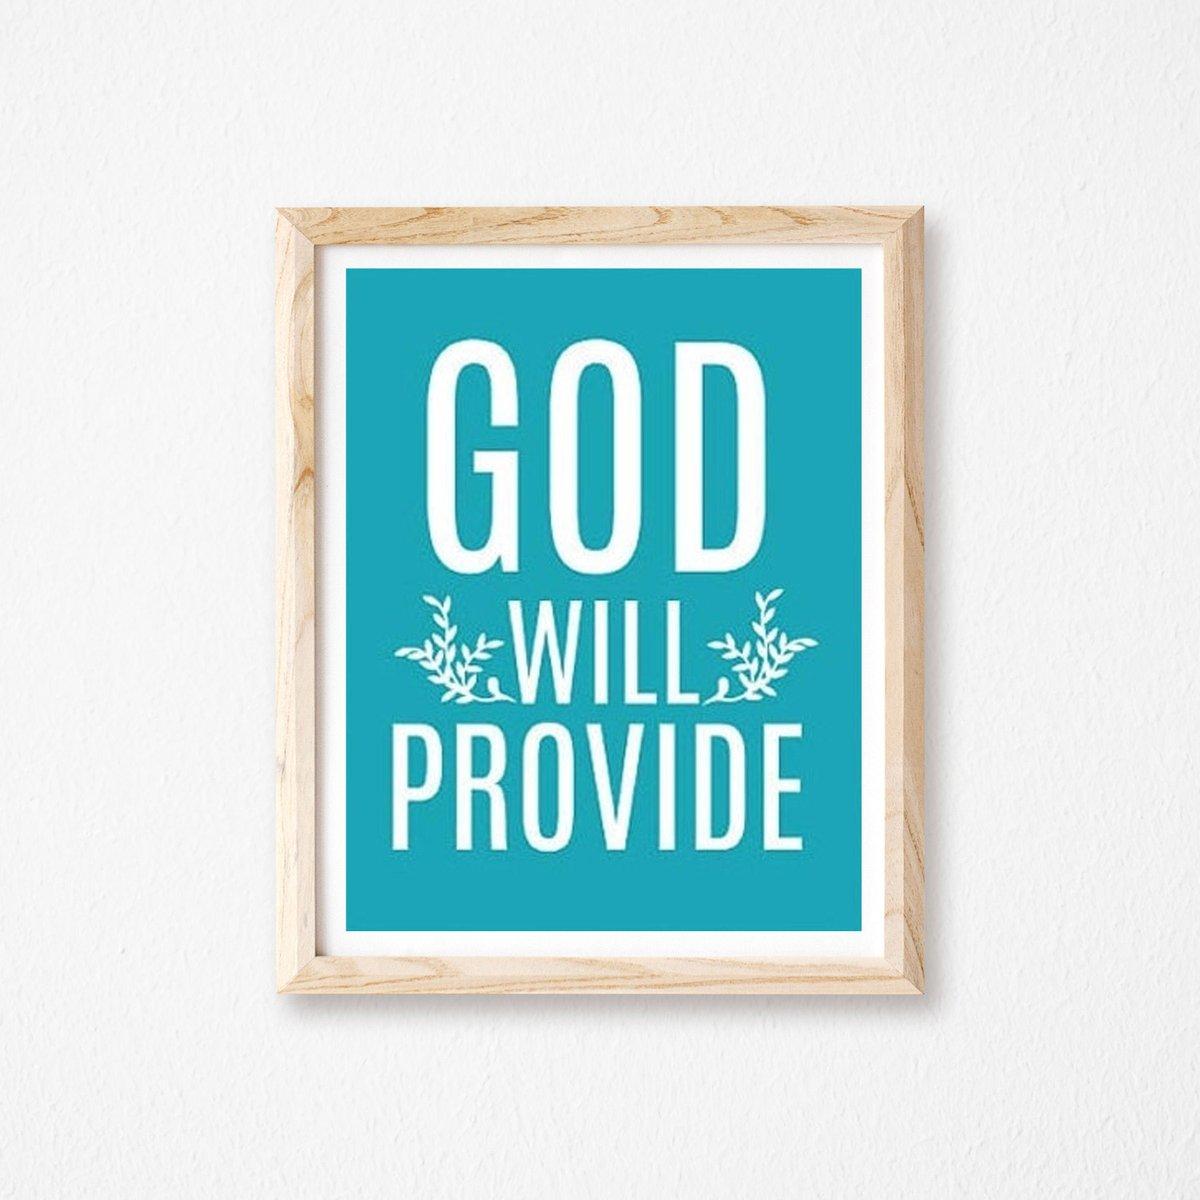 God Will Provide Bible Scripture Christian Art Home Decor, Custom Wall Art https://t.co/IetVcHdpxz #Etsy #truebluedesignco #ScripturePrint https://t.co/Cx70tVpNz0